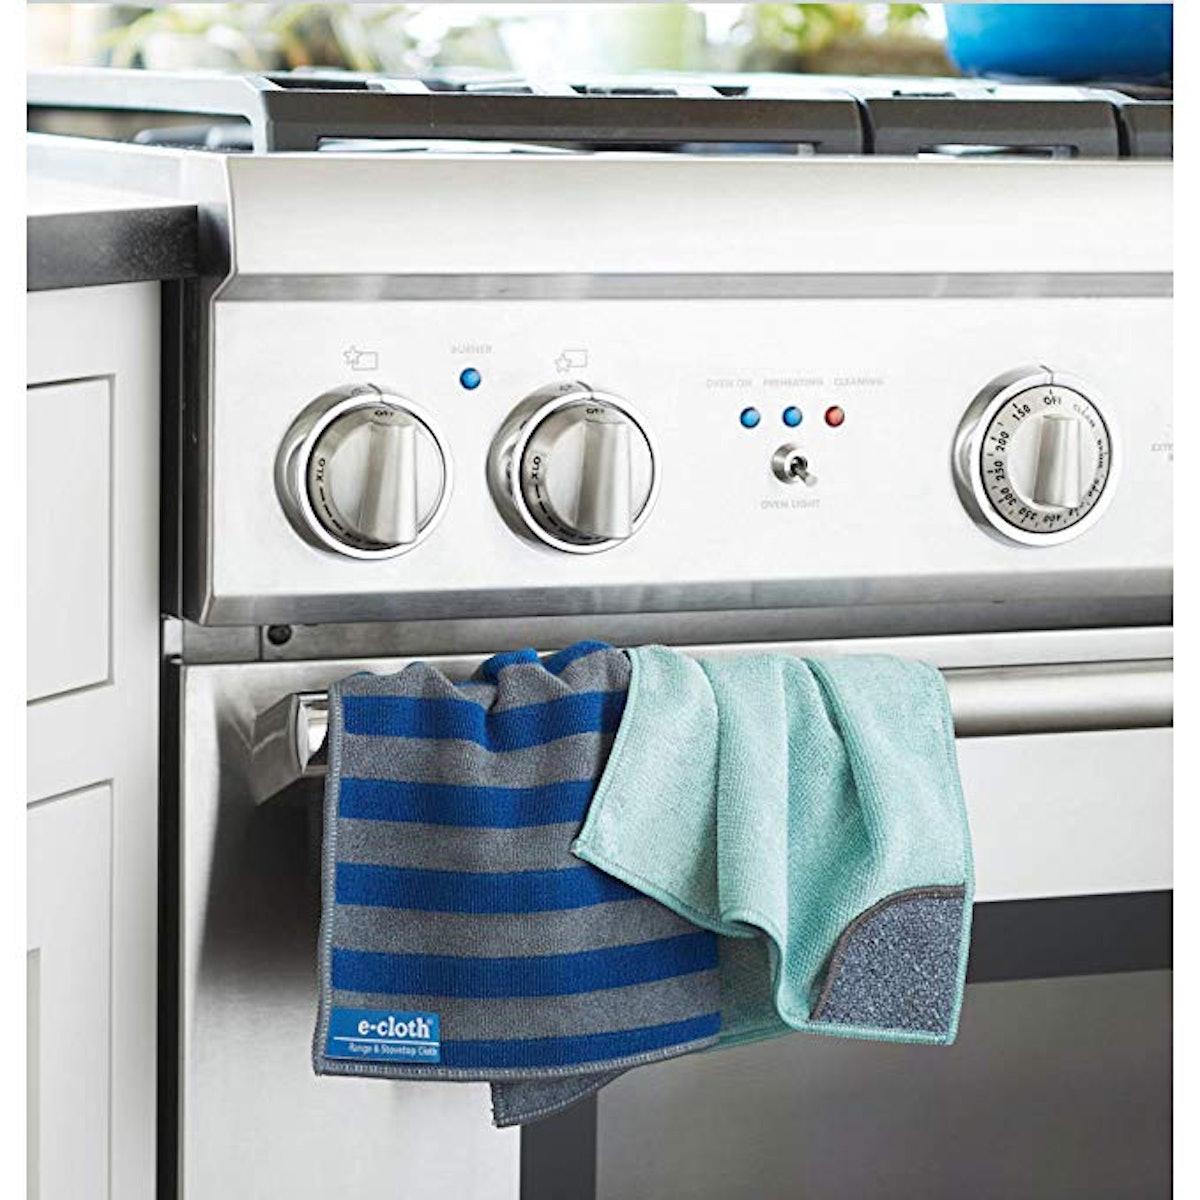 E-Cloth Kitchen Microfiber Cleaning Cloth